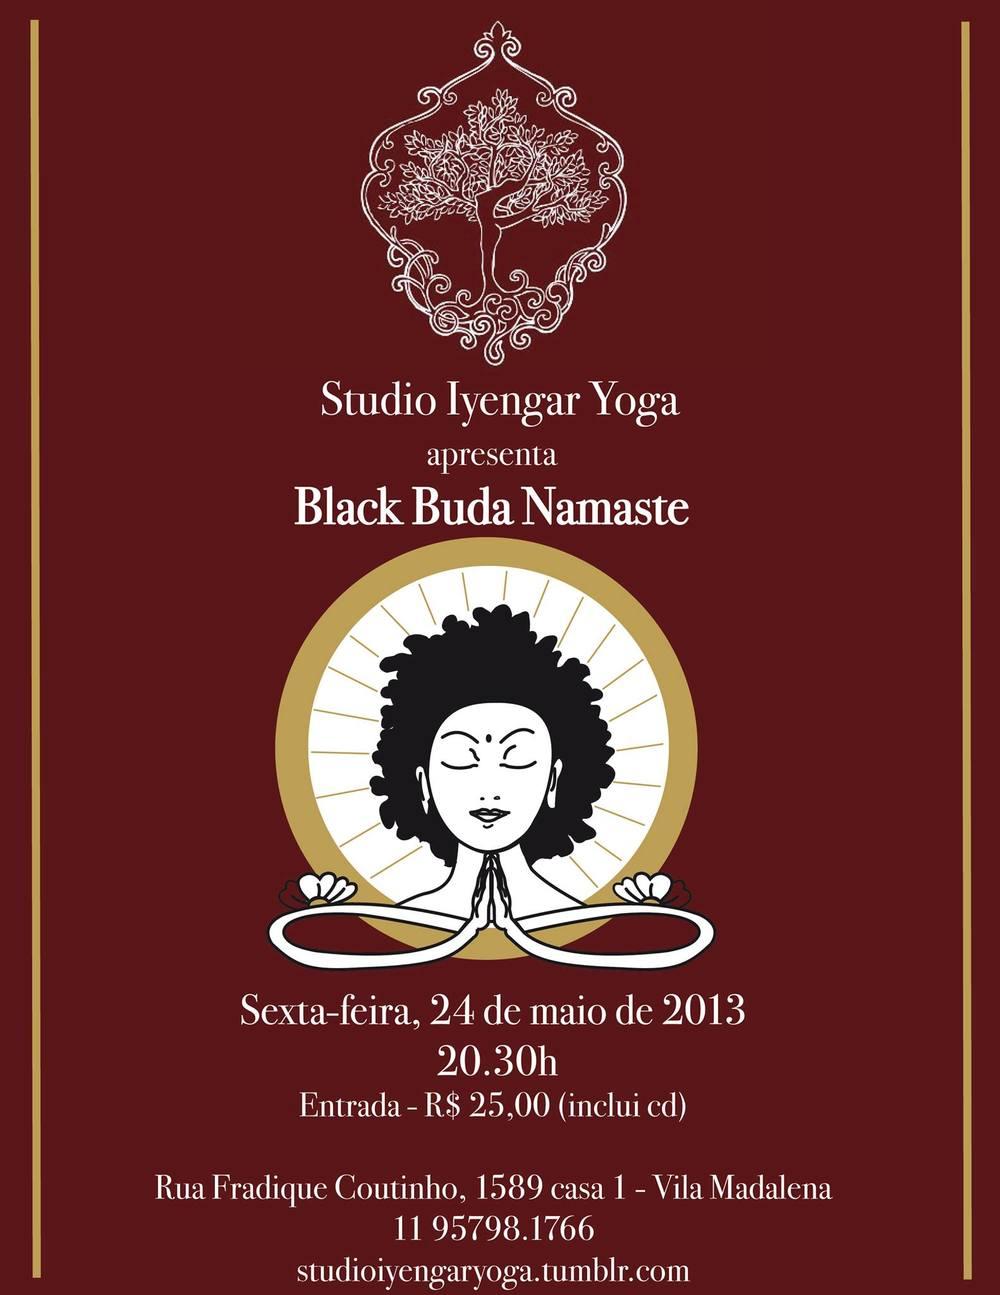 24/05/13 – Studio Iyengar Yoga – São Paulo, SP